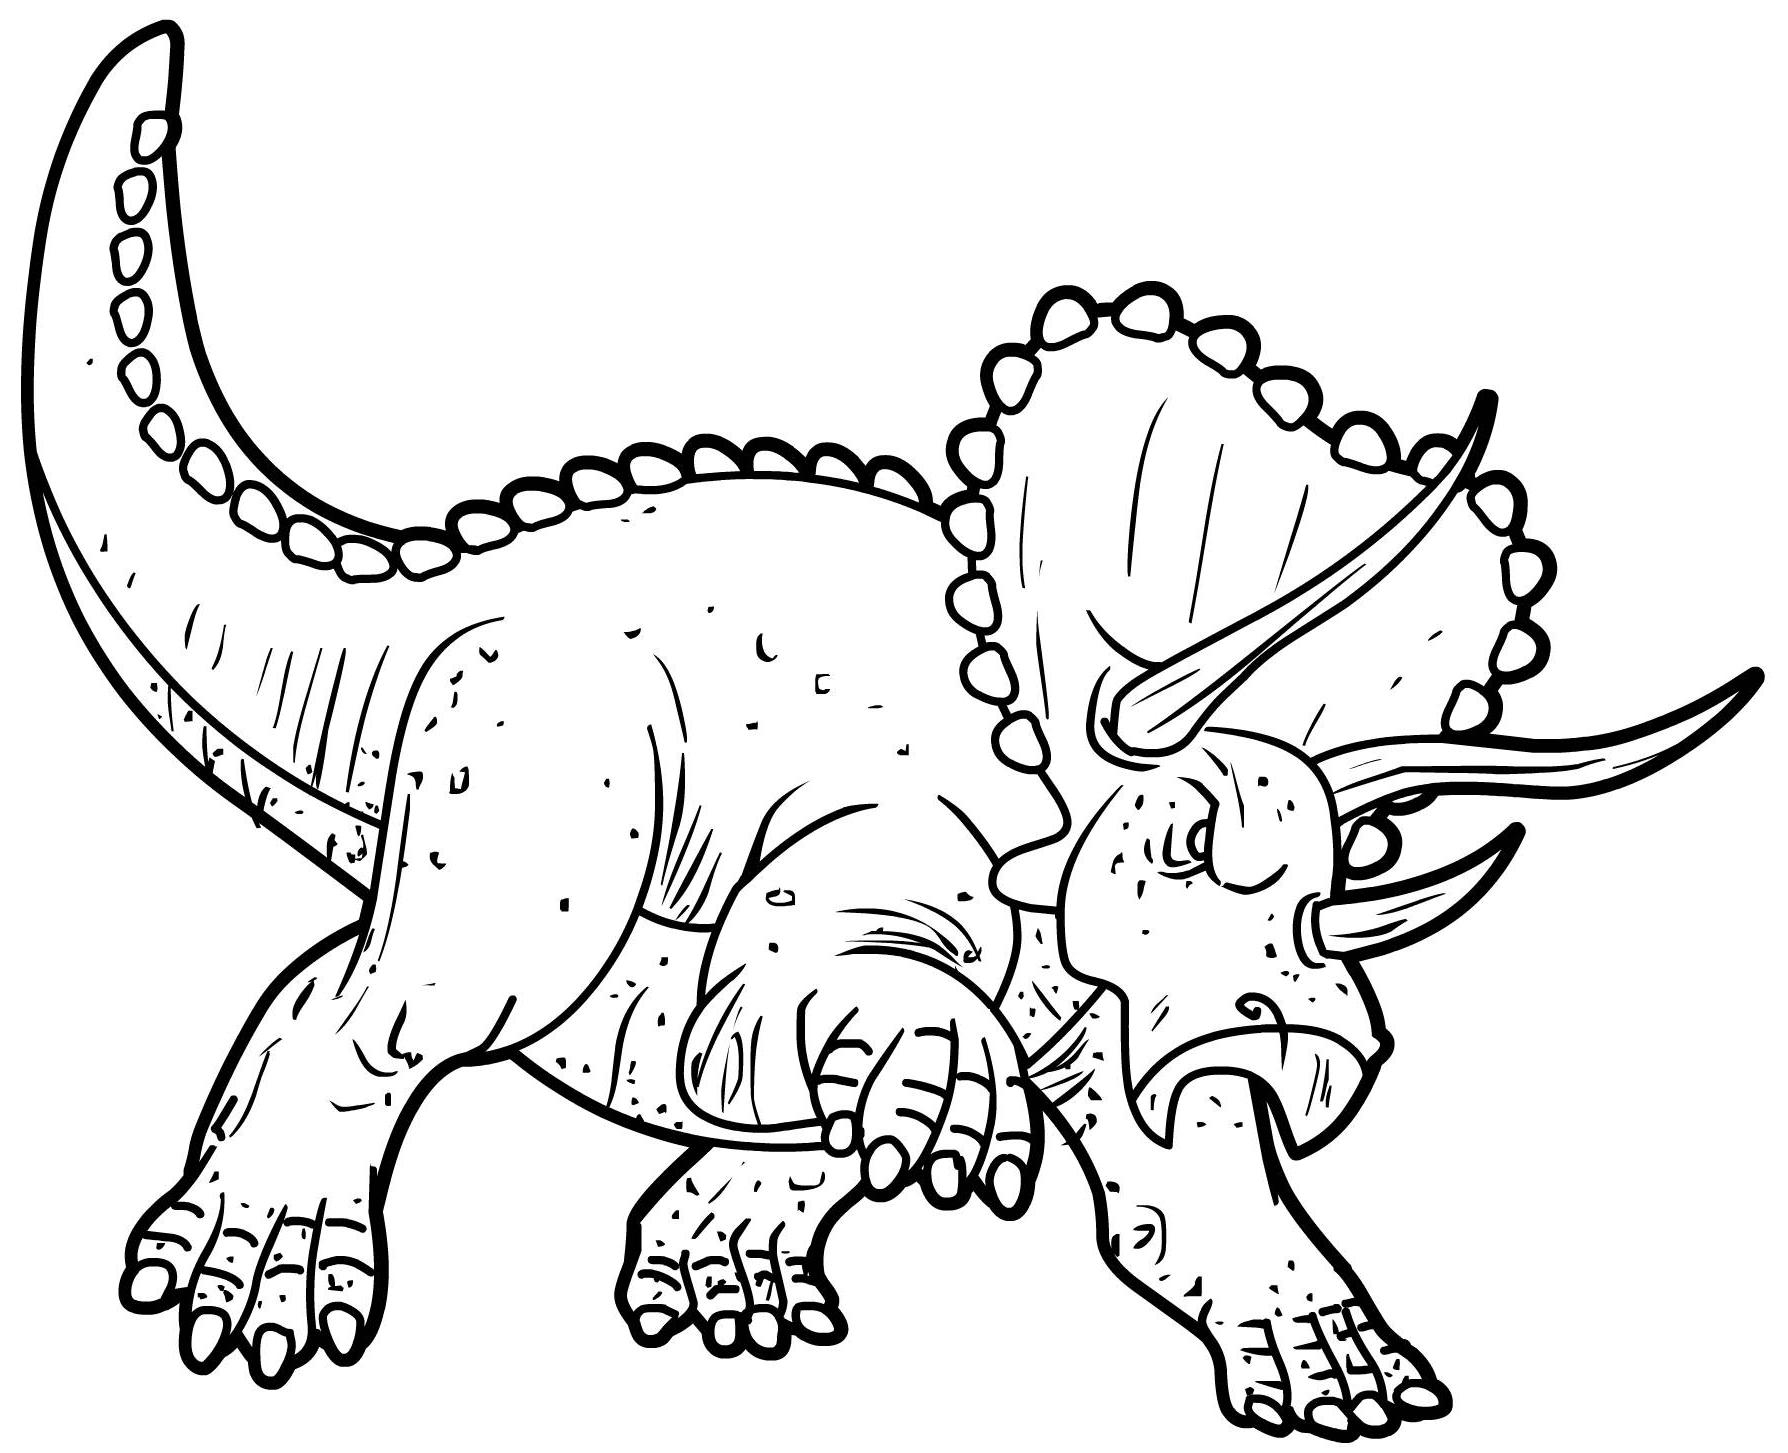 Coloriage Dinosaure Triceratops - 1001 Animaux serapportantà Dessin À Colorier Dinosaure